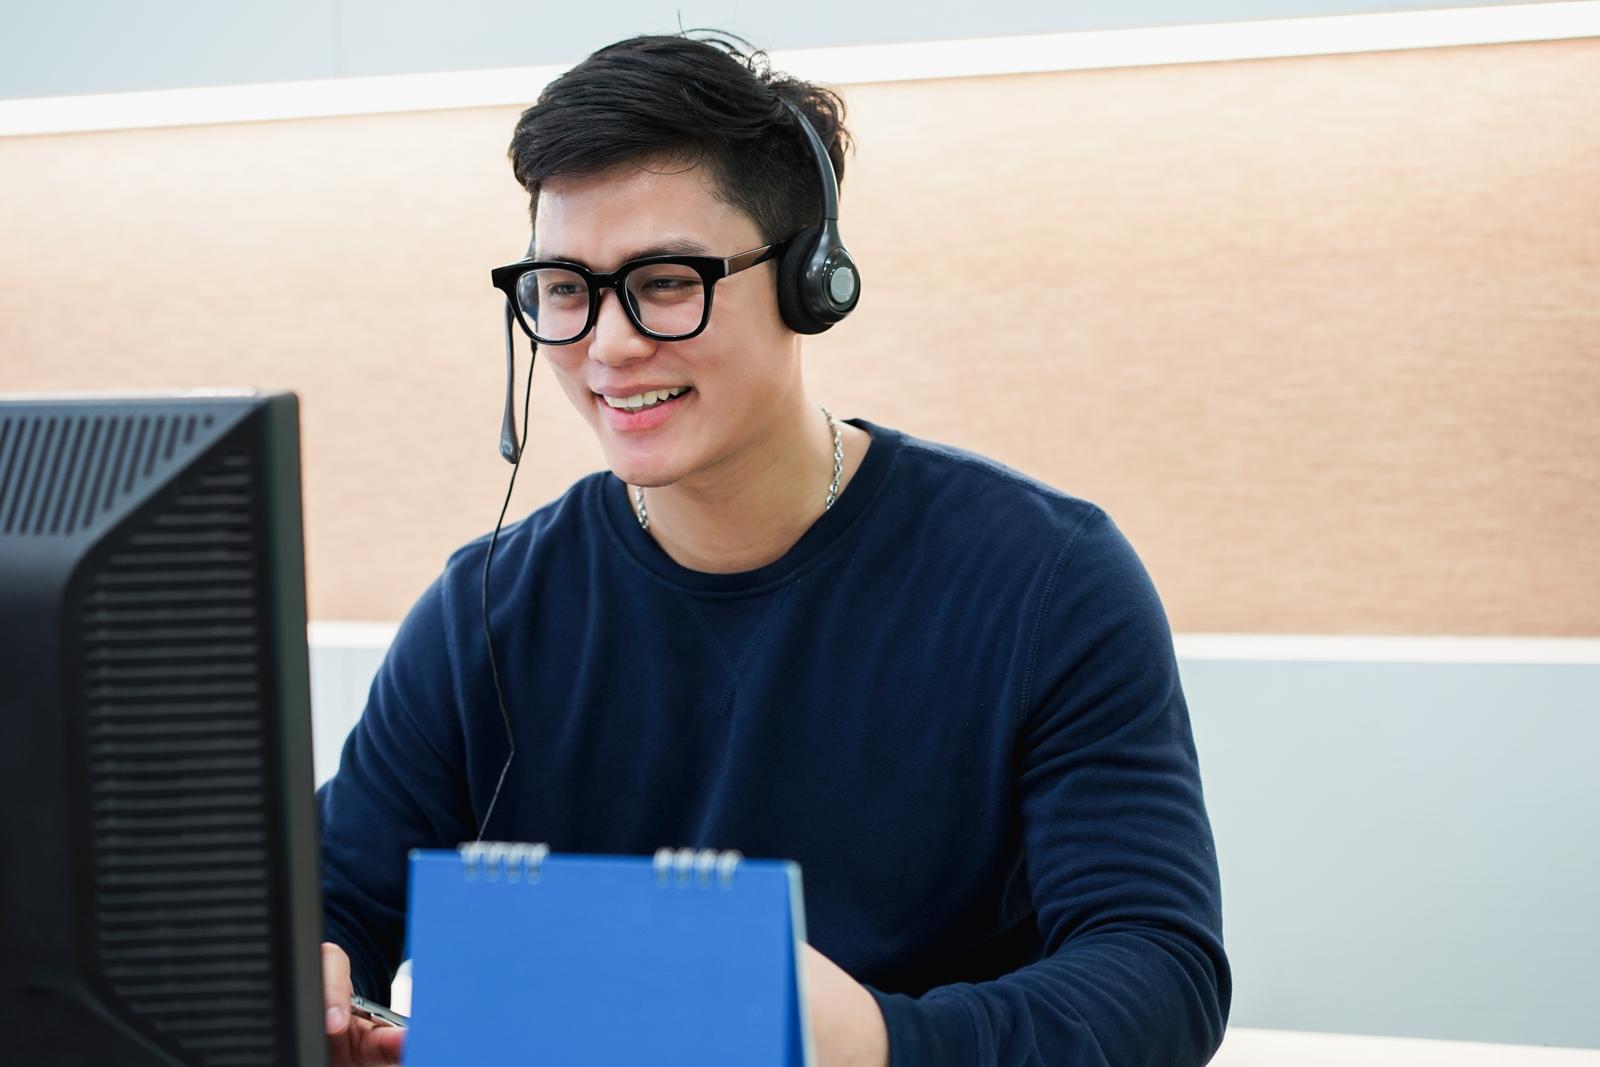 Kundenservice - Customer Service